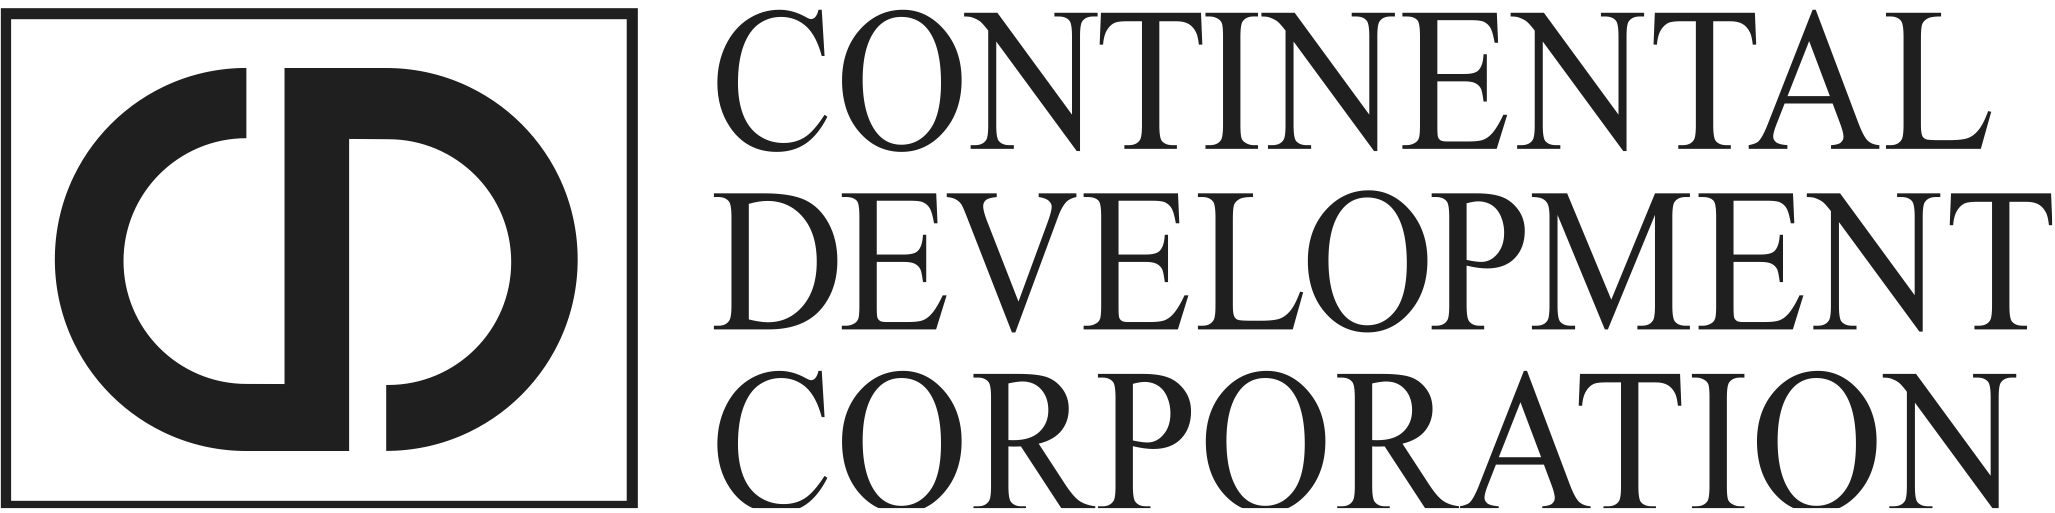 continentaldevelopmentcorp-2055x513.jpg